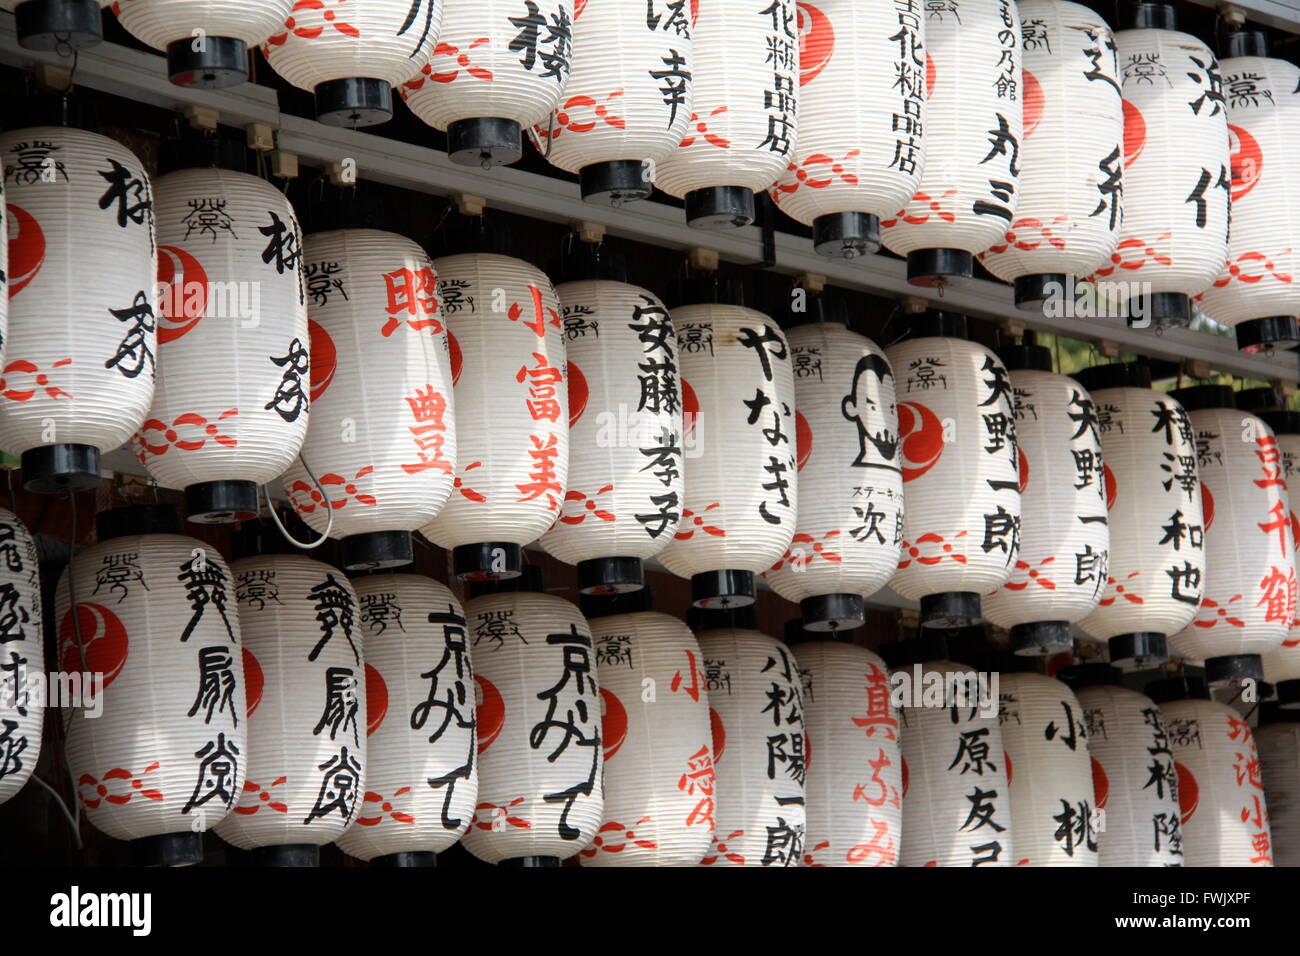 Japanese lanterns at Yasaka shrine, Kyoto, Japan - Stock Image